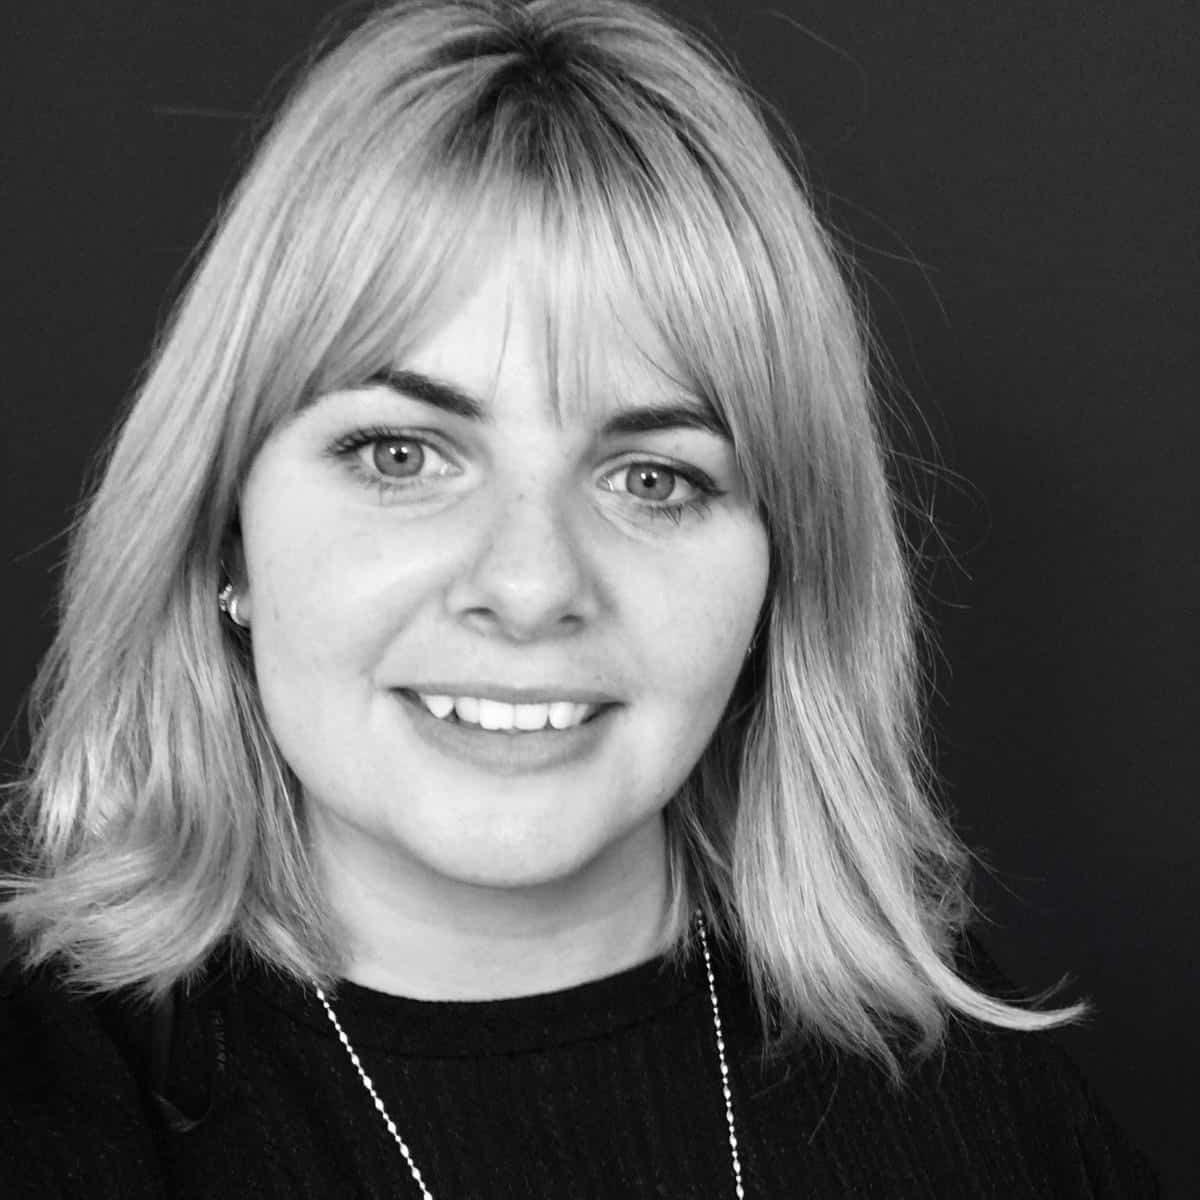 Kiera G - Artistic Director